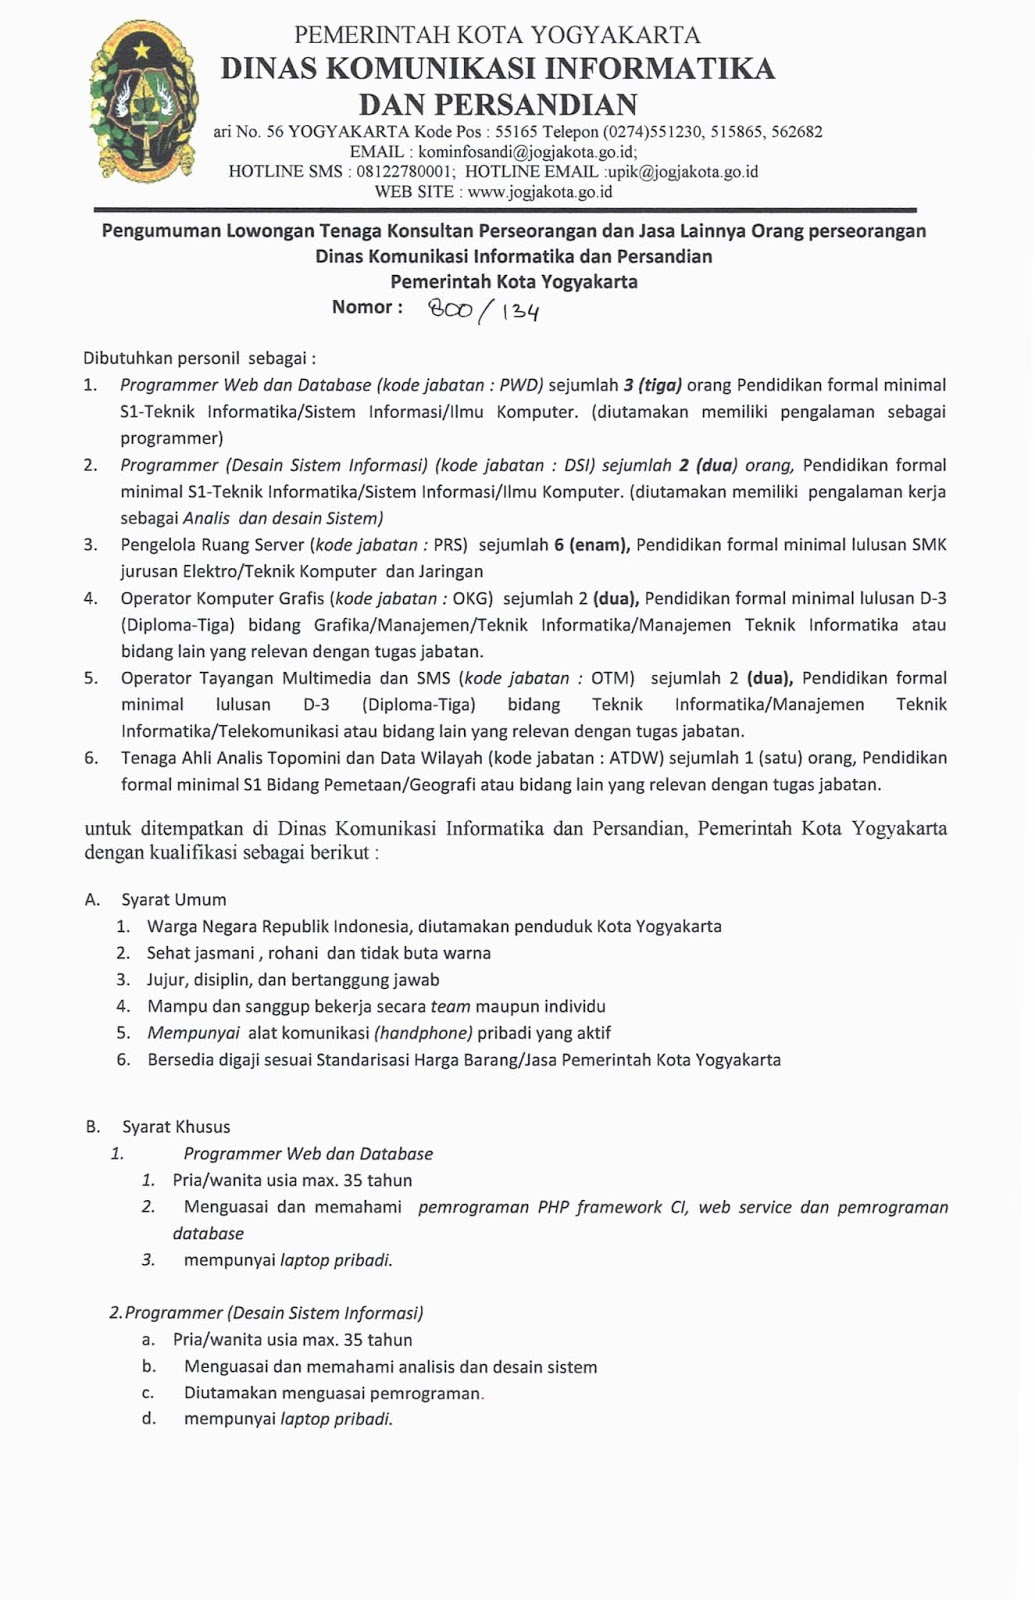 Lowongan Non PNS Dinas Komunikasi Informatika dan Persandian Tahun 2020